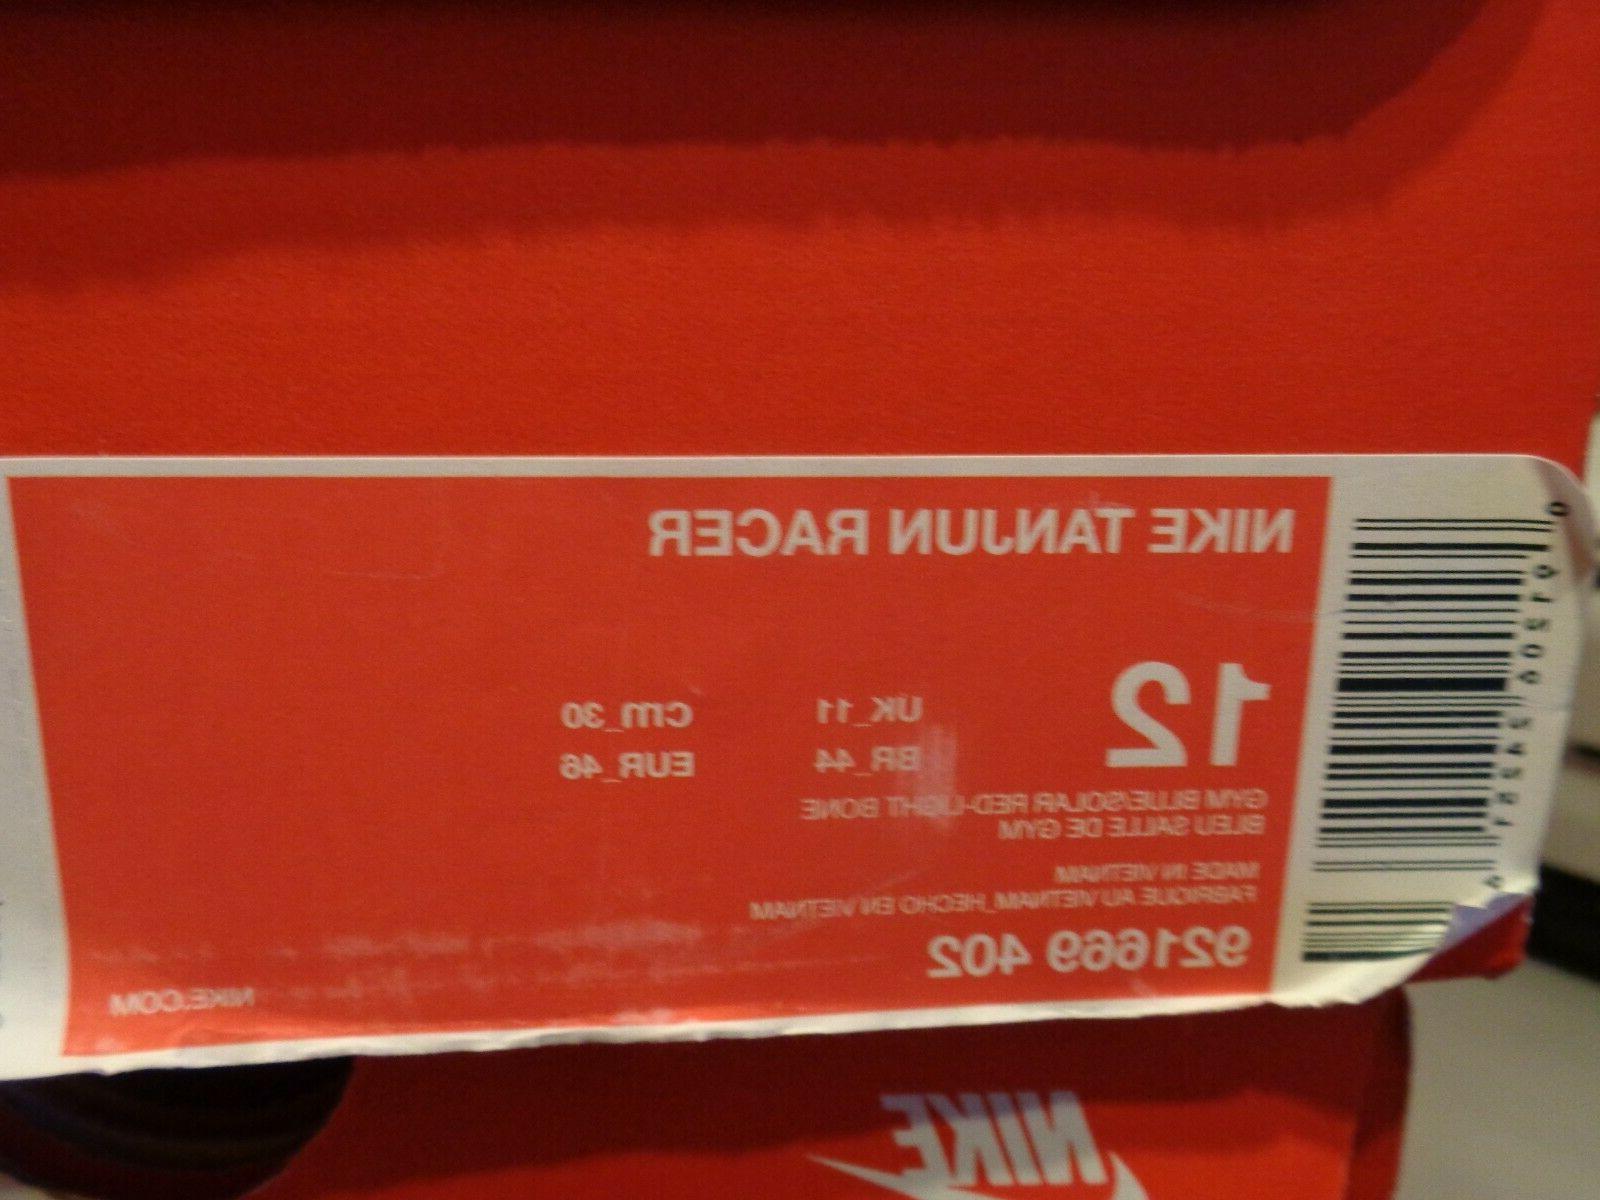 Nike Tanjun Racer Running Shoes, Size 12 NWB